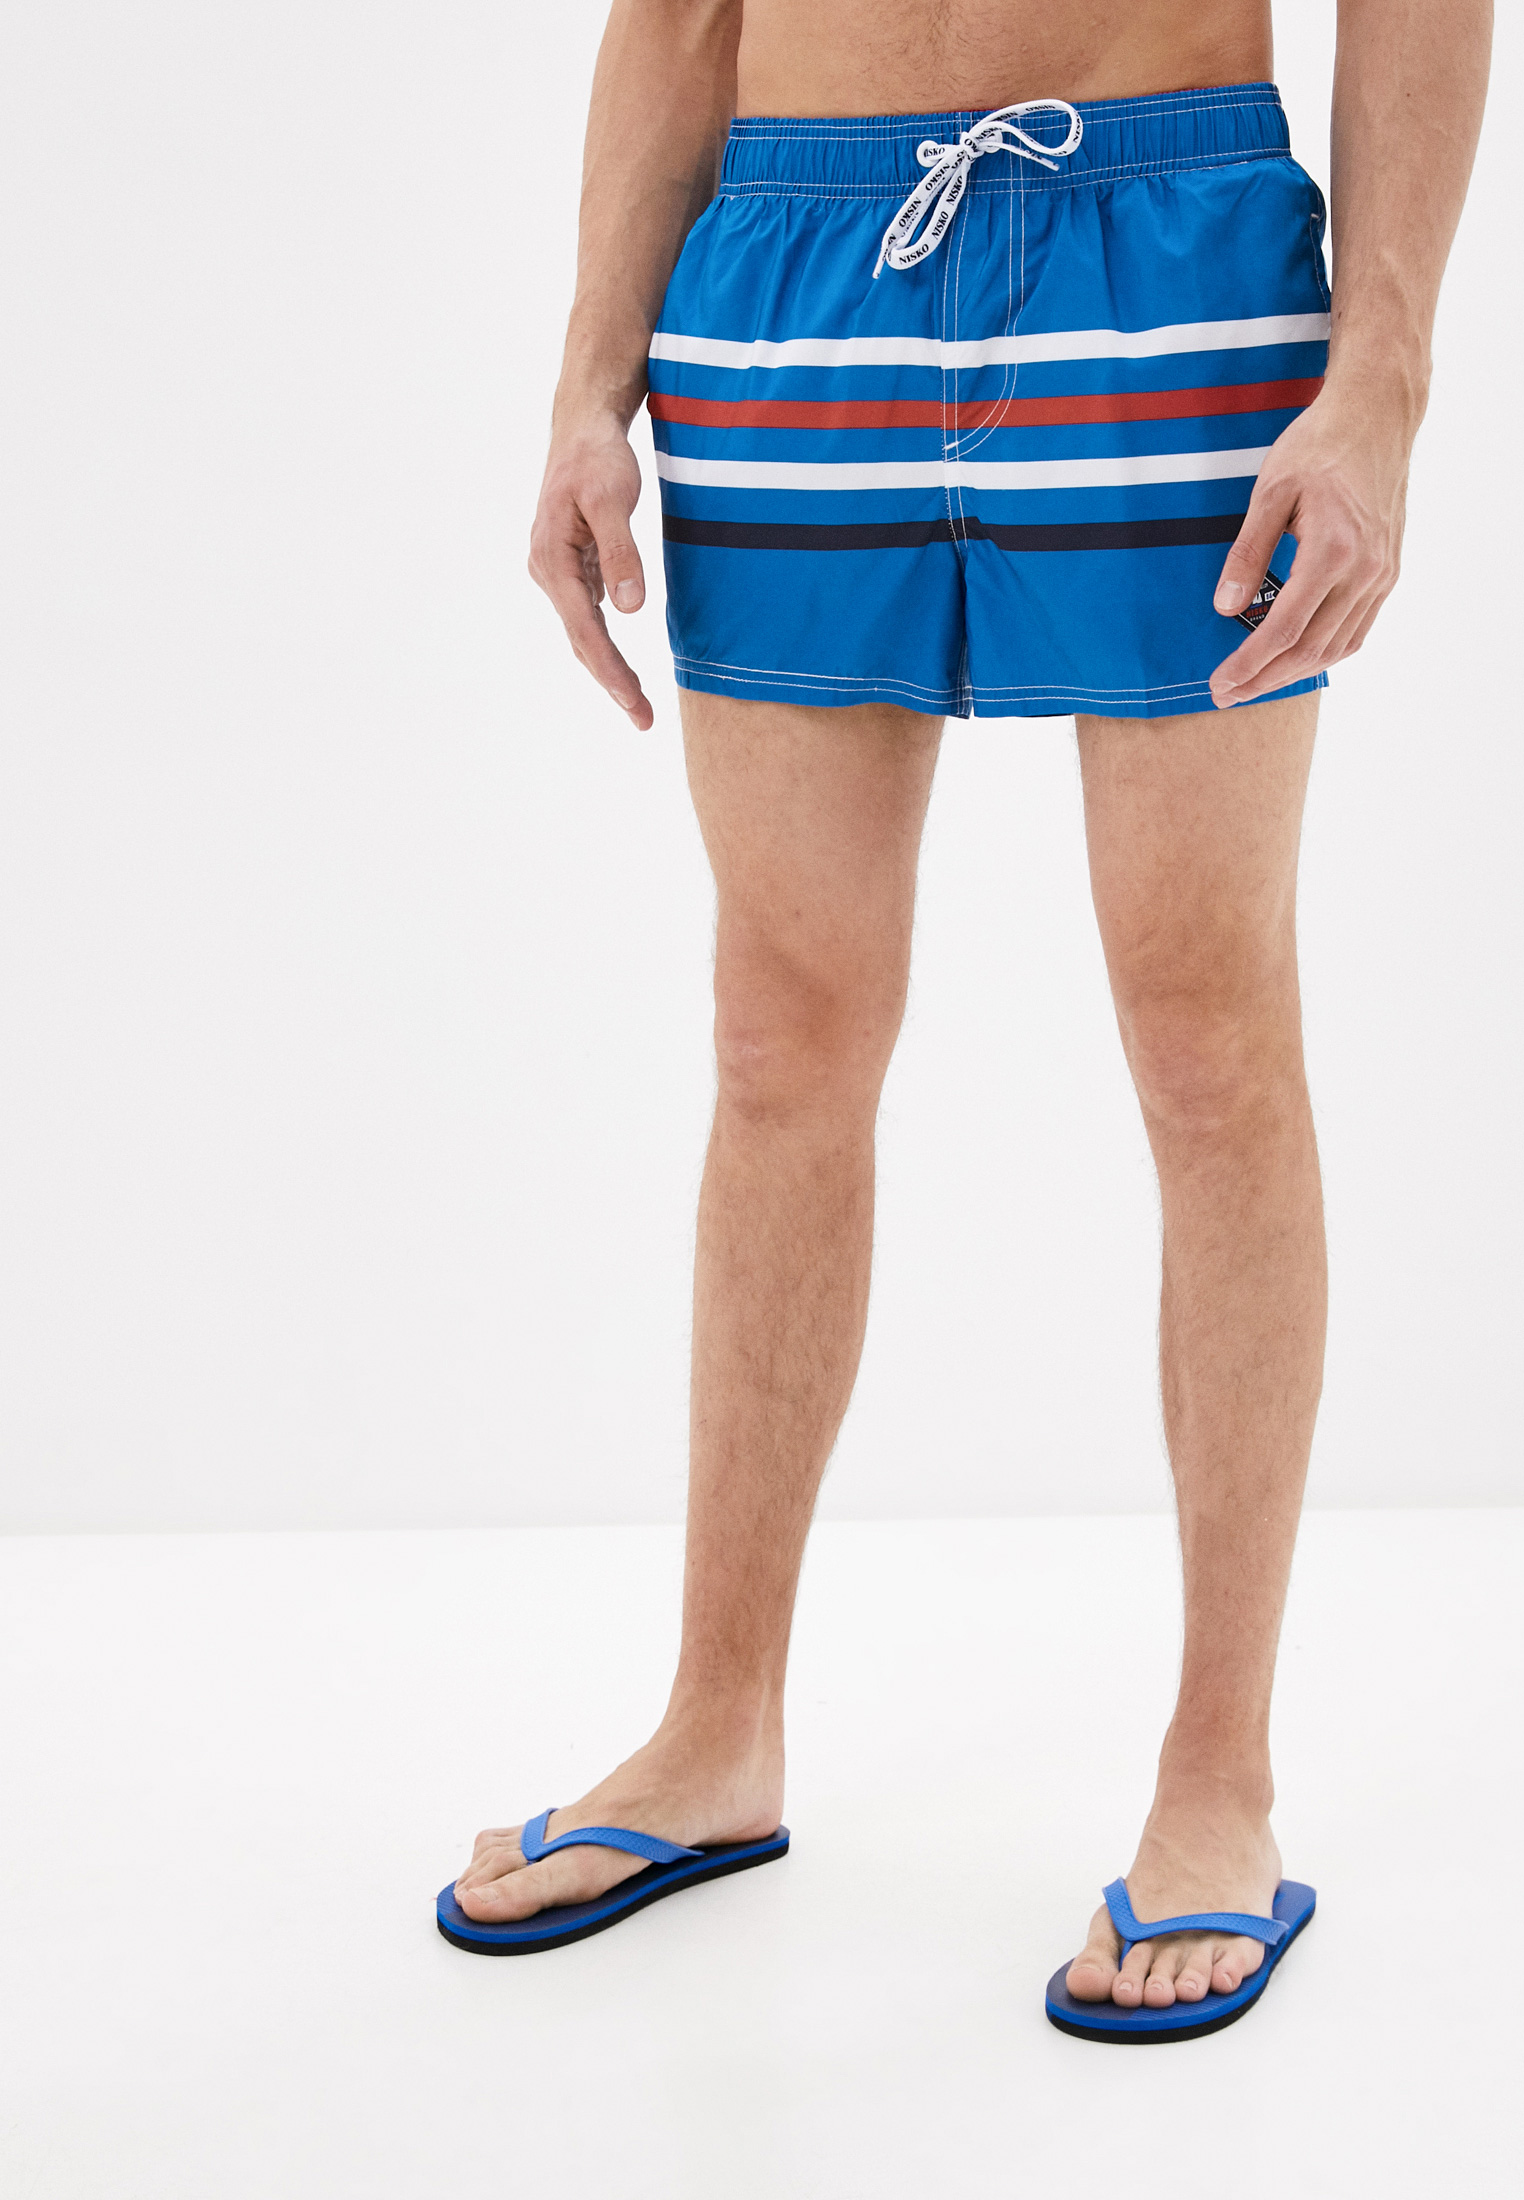 Мужские шорты для плавания Nisko 1841